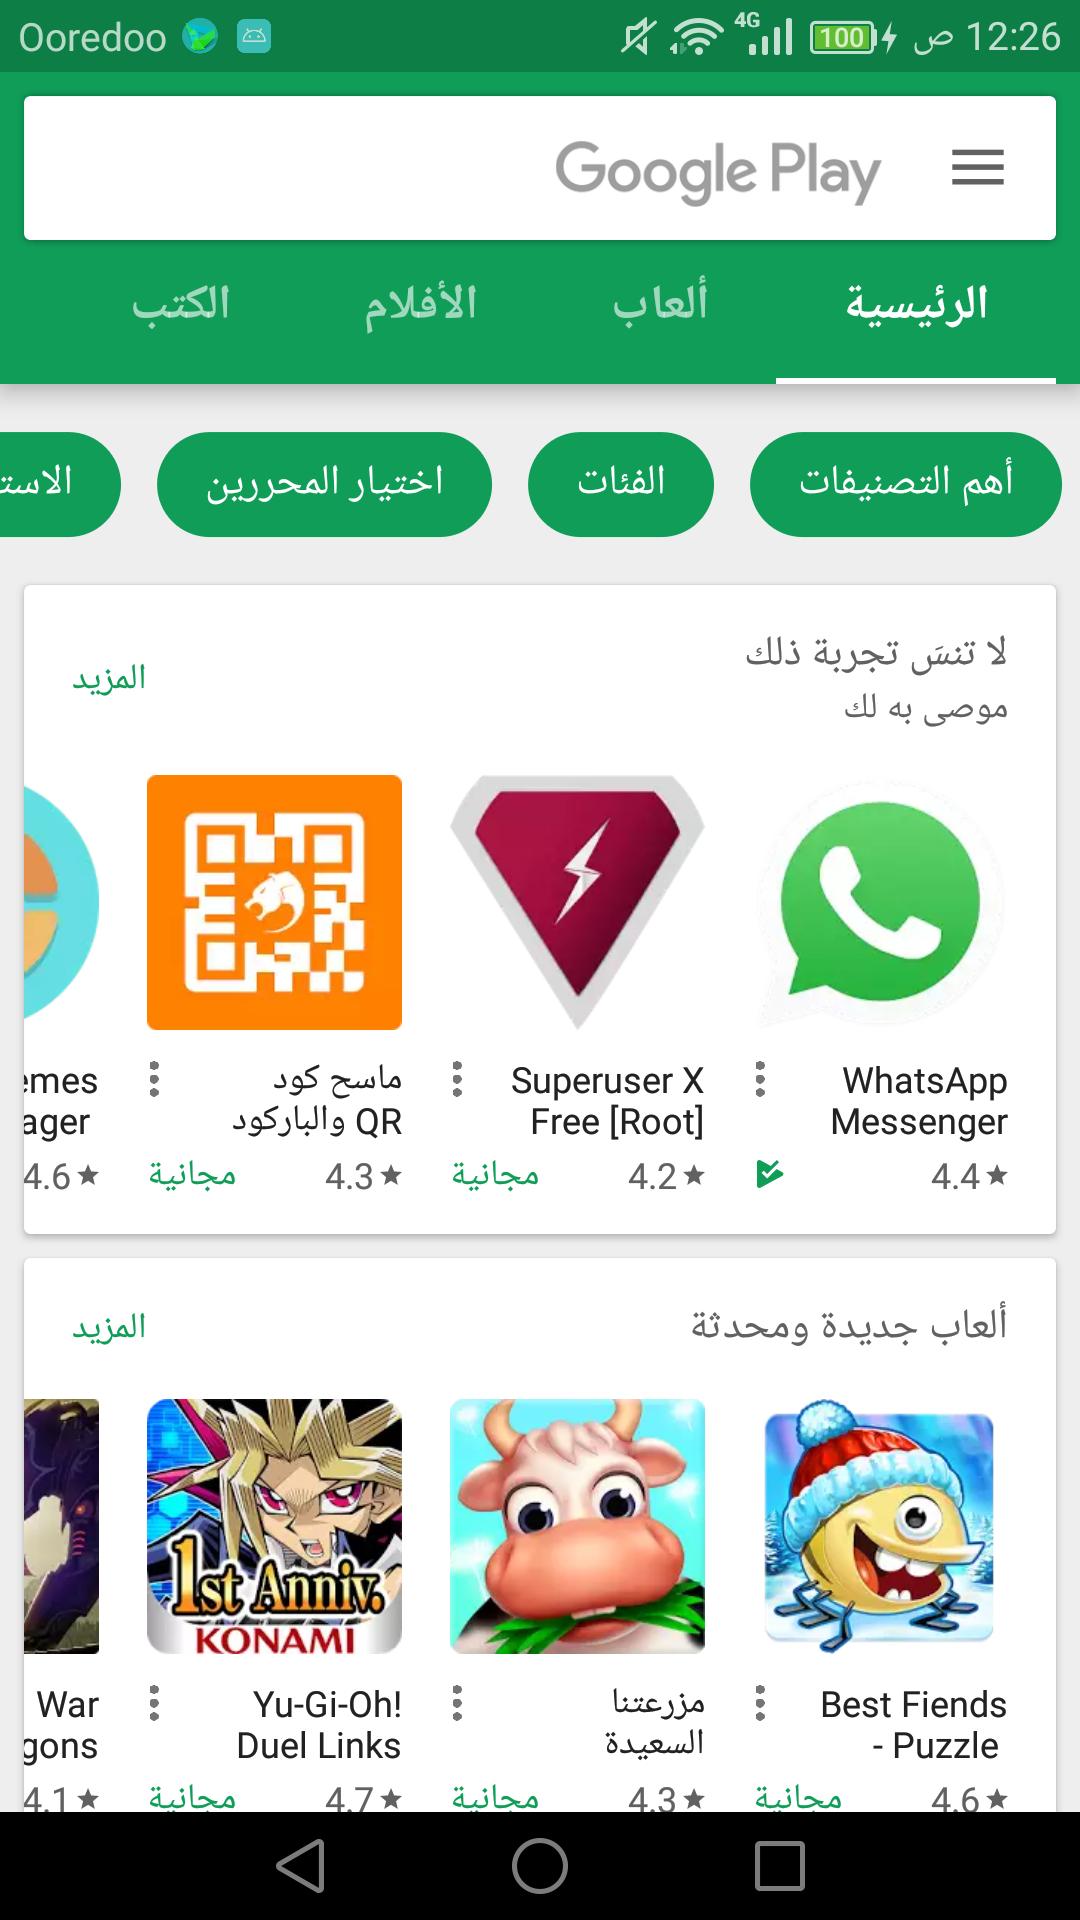 13042818pm 1215598 281348 5185053 652418.html